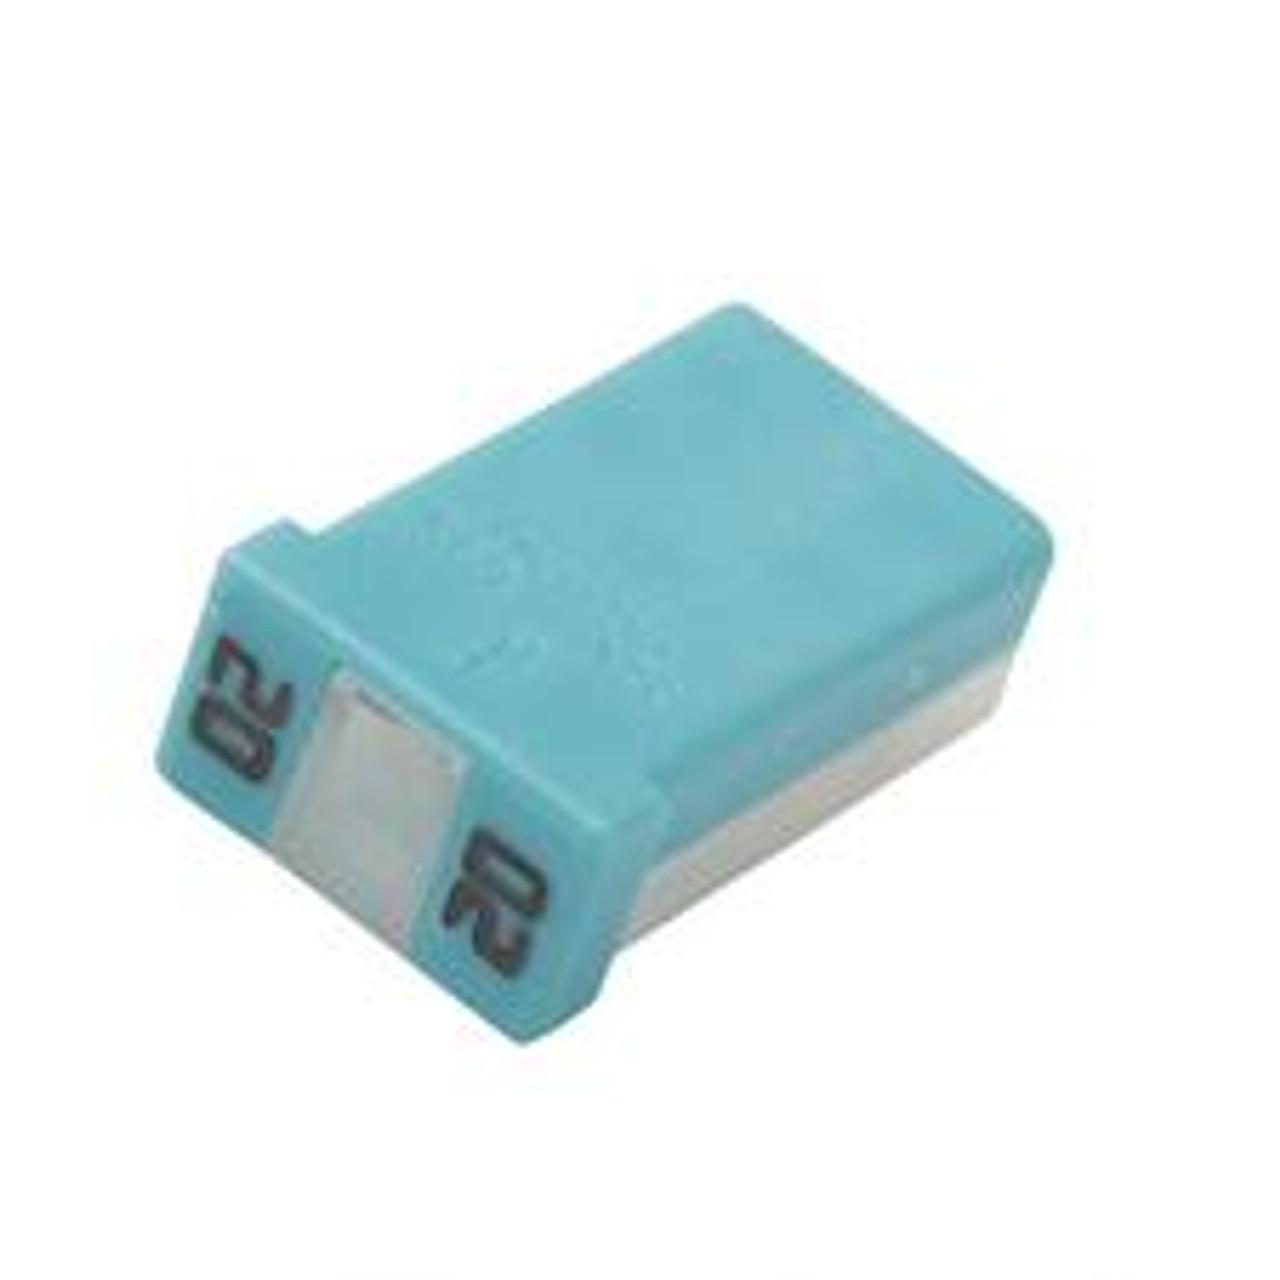 MCASE20 --- 20 Amp MCASE Cartridge Fuse